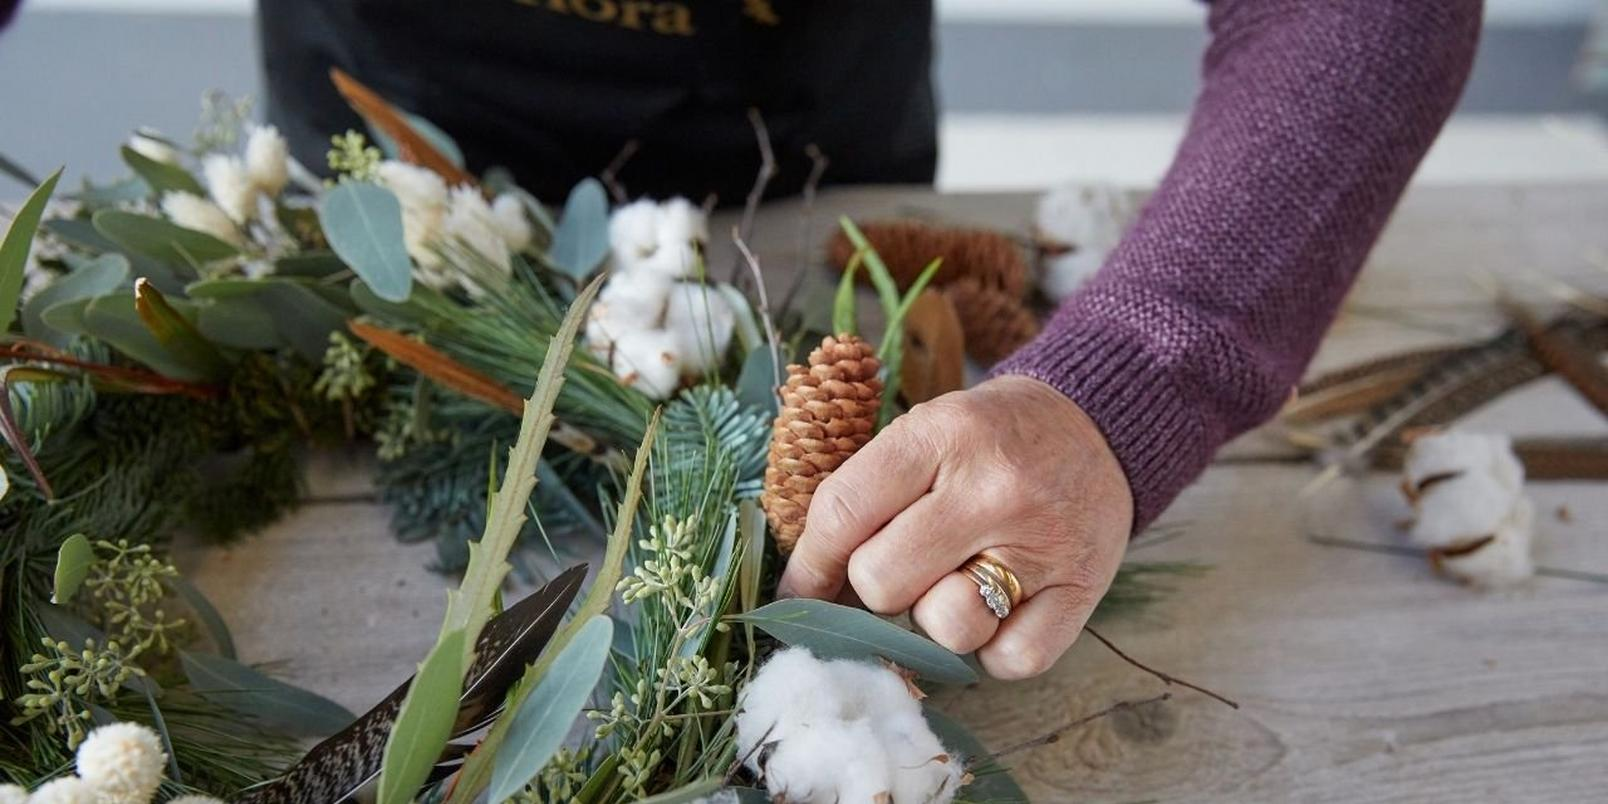 how_to_make_a_foilage_Christmas_wreath-17